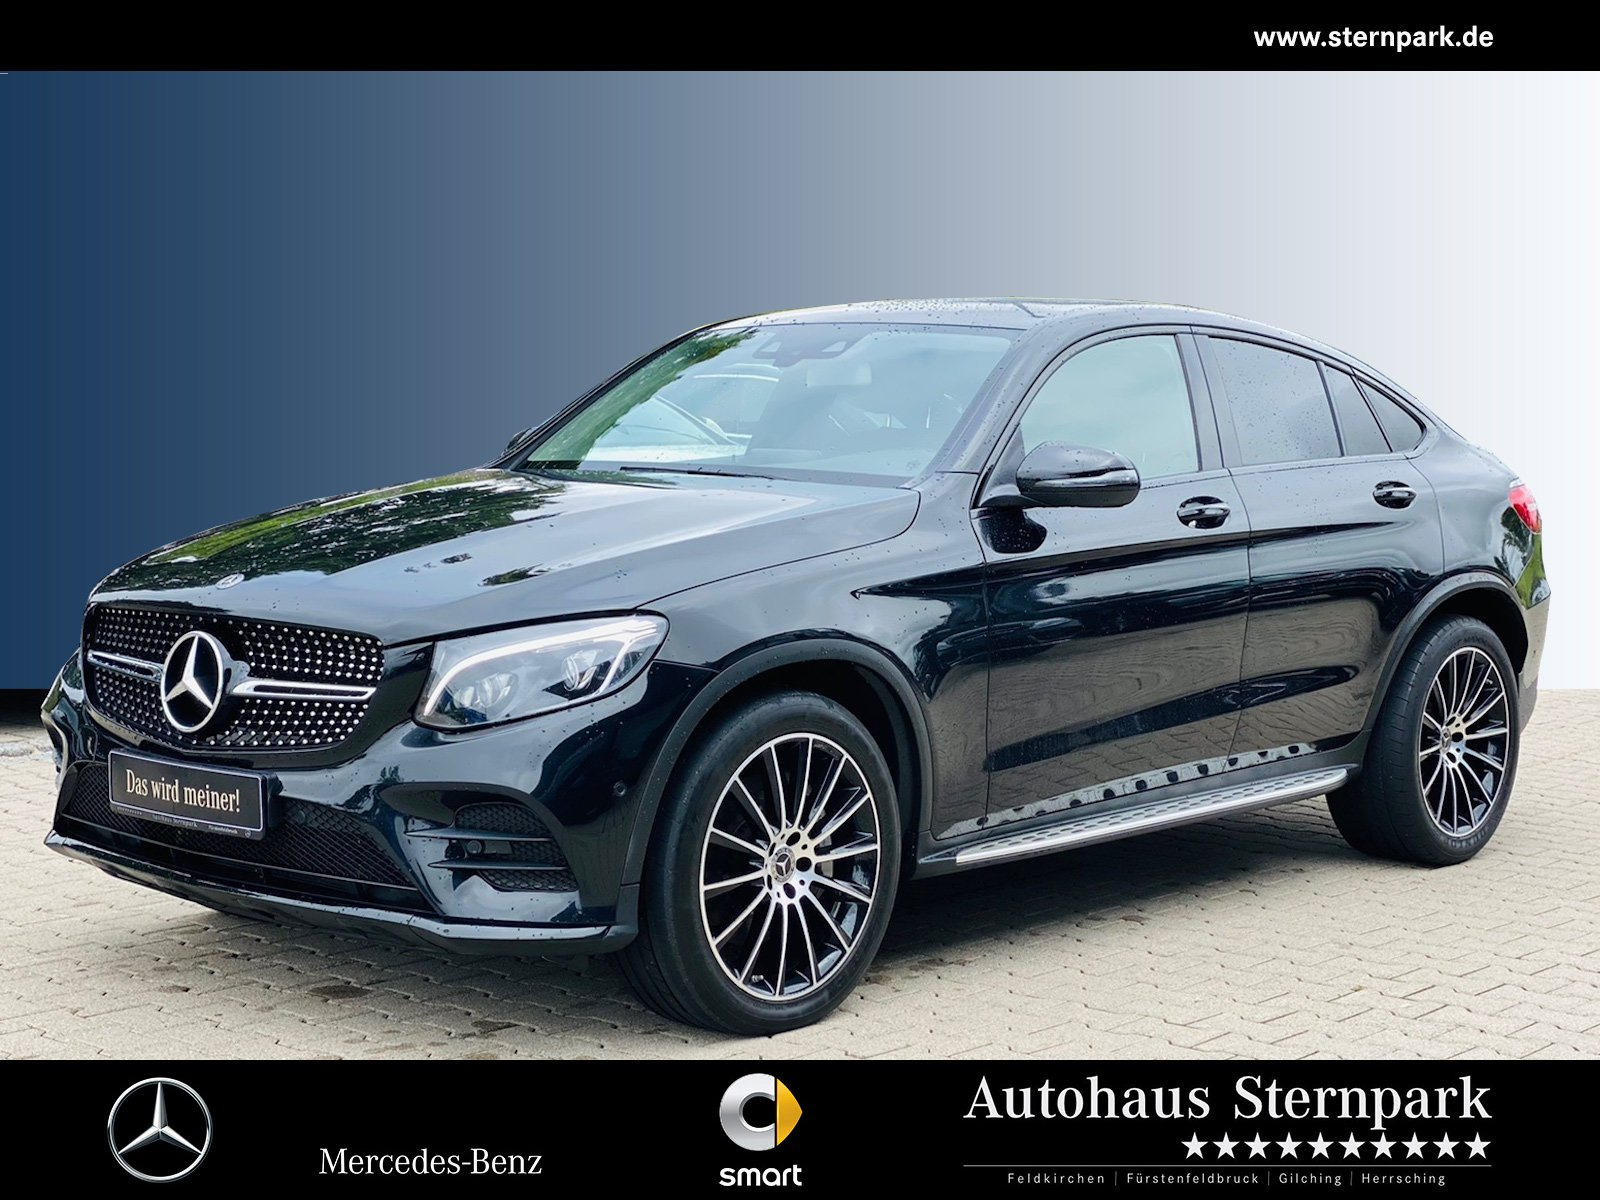 Mercedes-Benz GLC 300 4M Coupé AMG COMAND/Night/HUD/Kamera/LED, Jahr 2018, Benzin